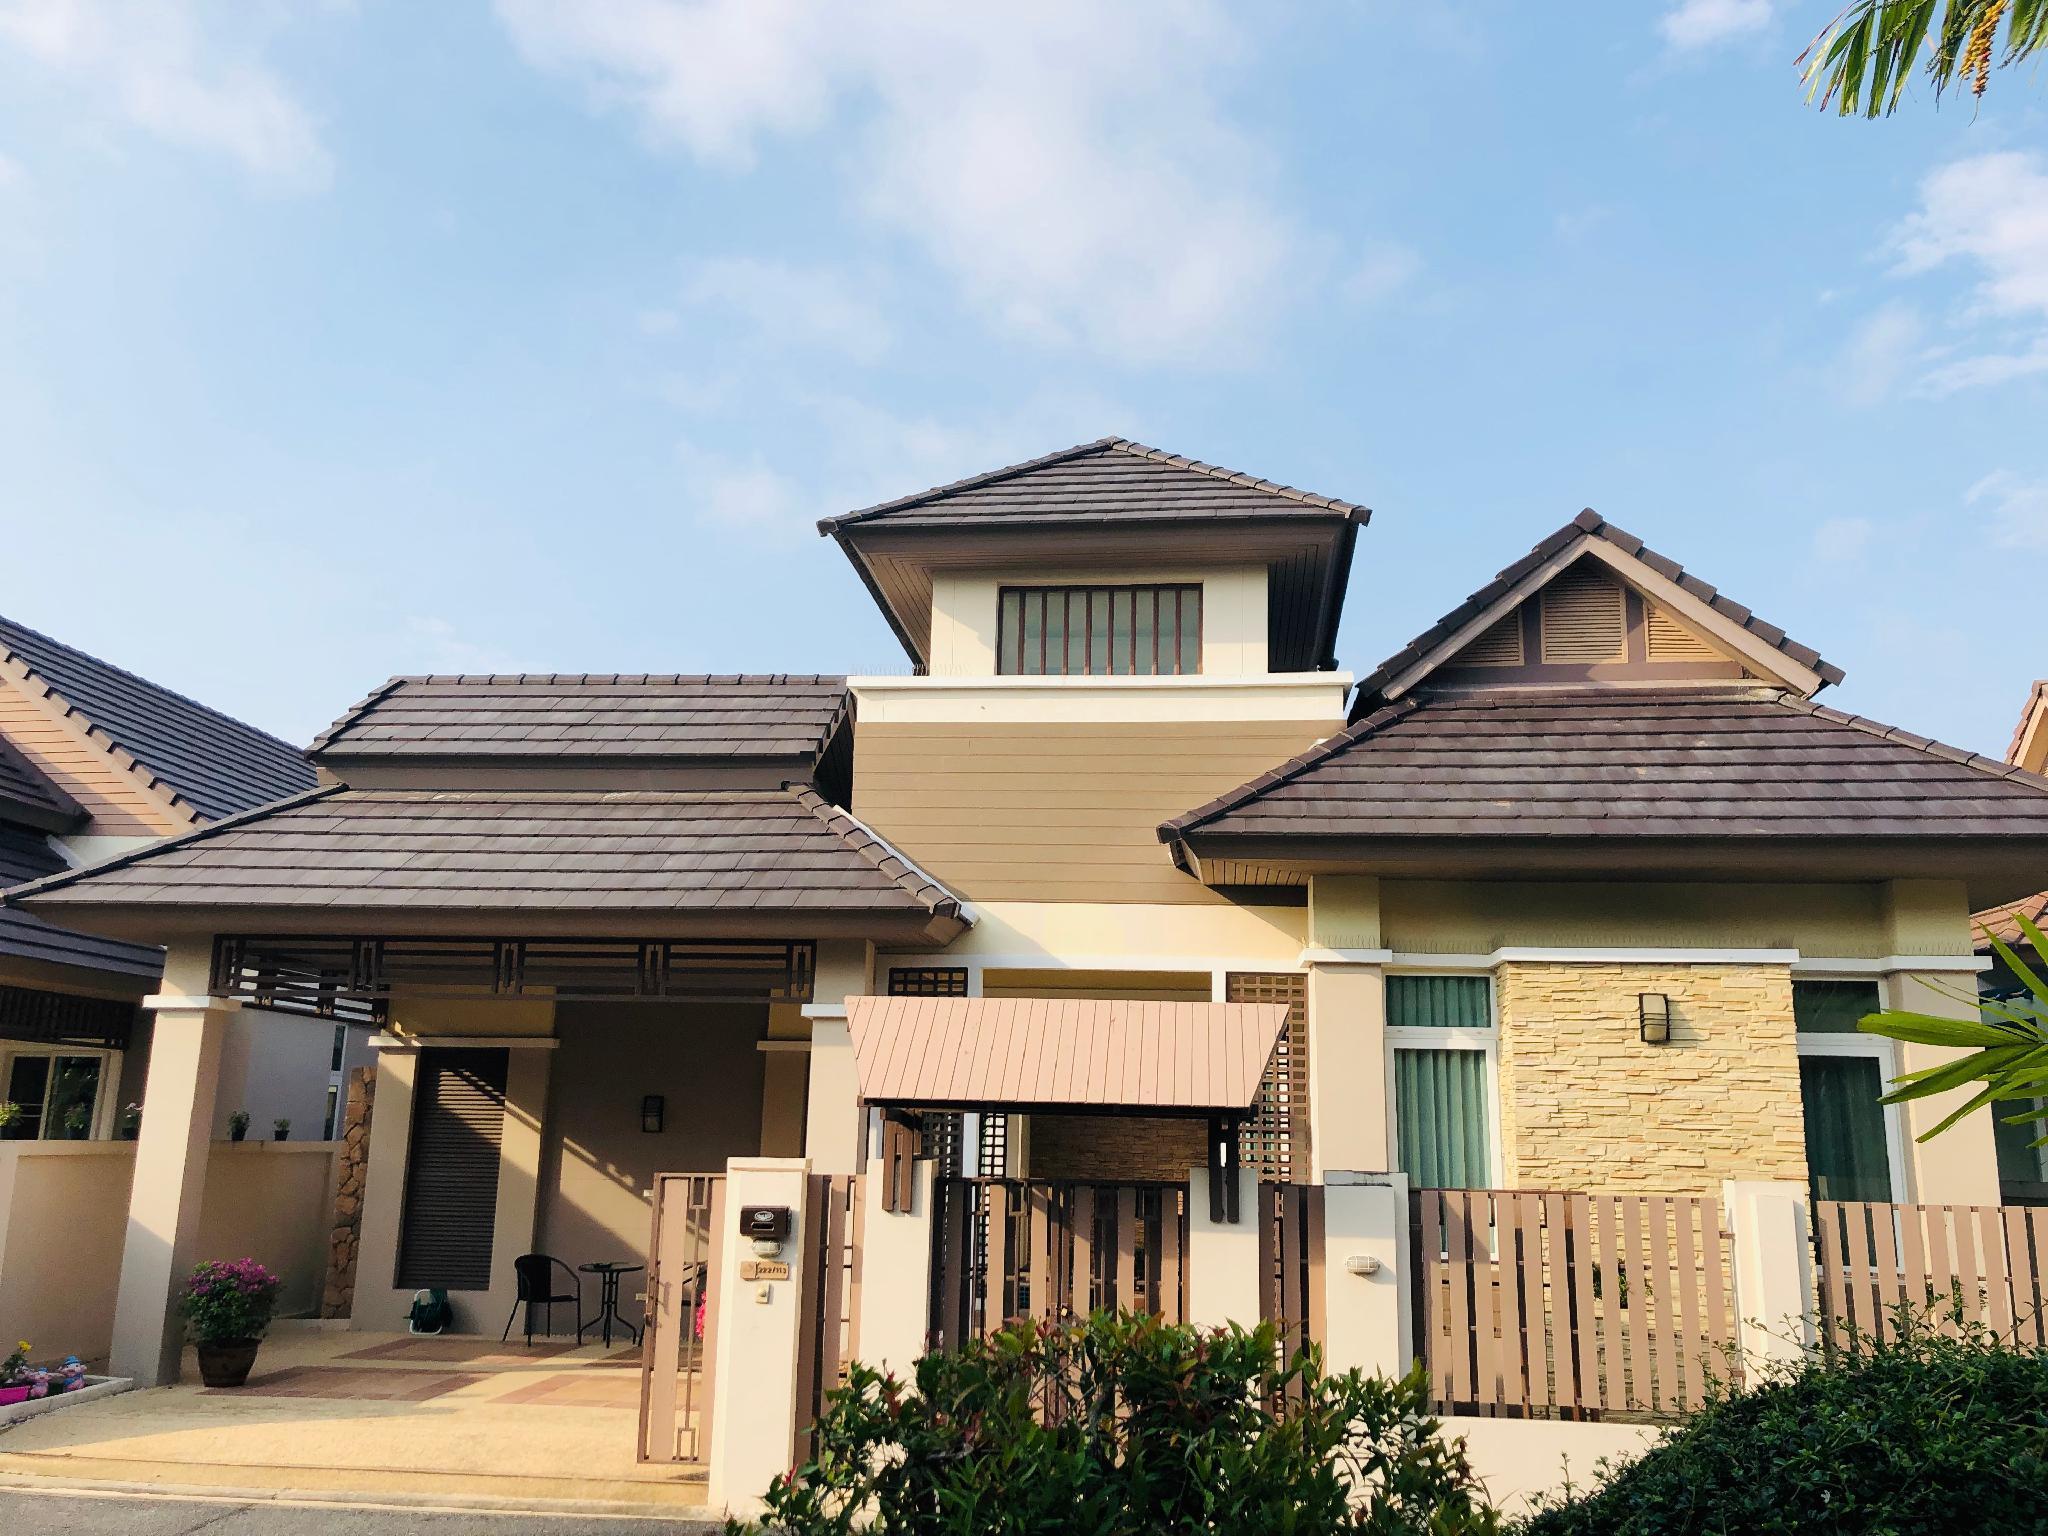 High-quality Swimming Pool Villa in Pattaya 高端泳池别墅 วิลลา 2 ห้องนอน 2 ห้องน้ำส่วนตัว ขนาด 280 ตร.ม. – มาบประชันเรเซอเวอร์